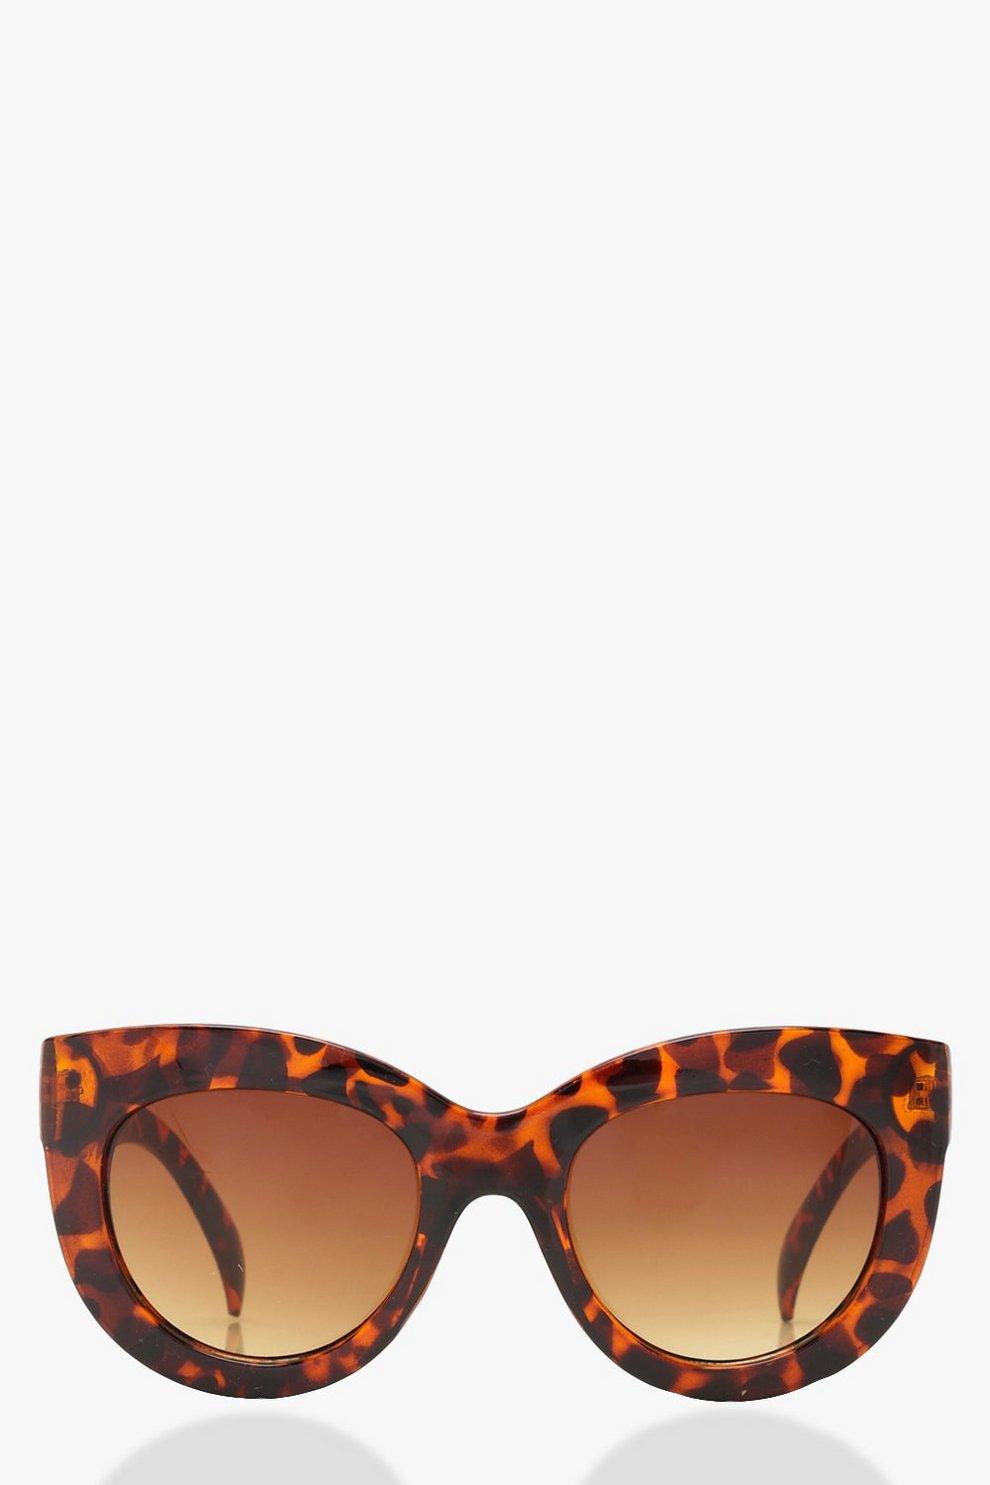 9c10f1e967 Oversized Tortoiseshell Cat Eye Sunglasses